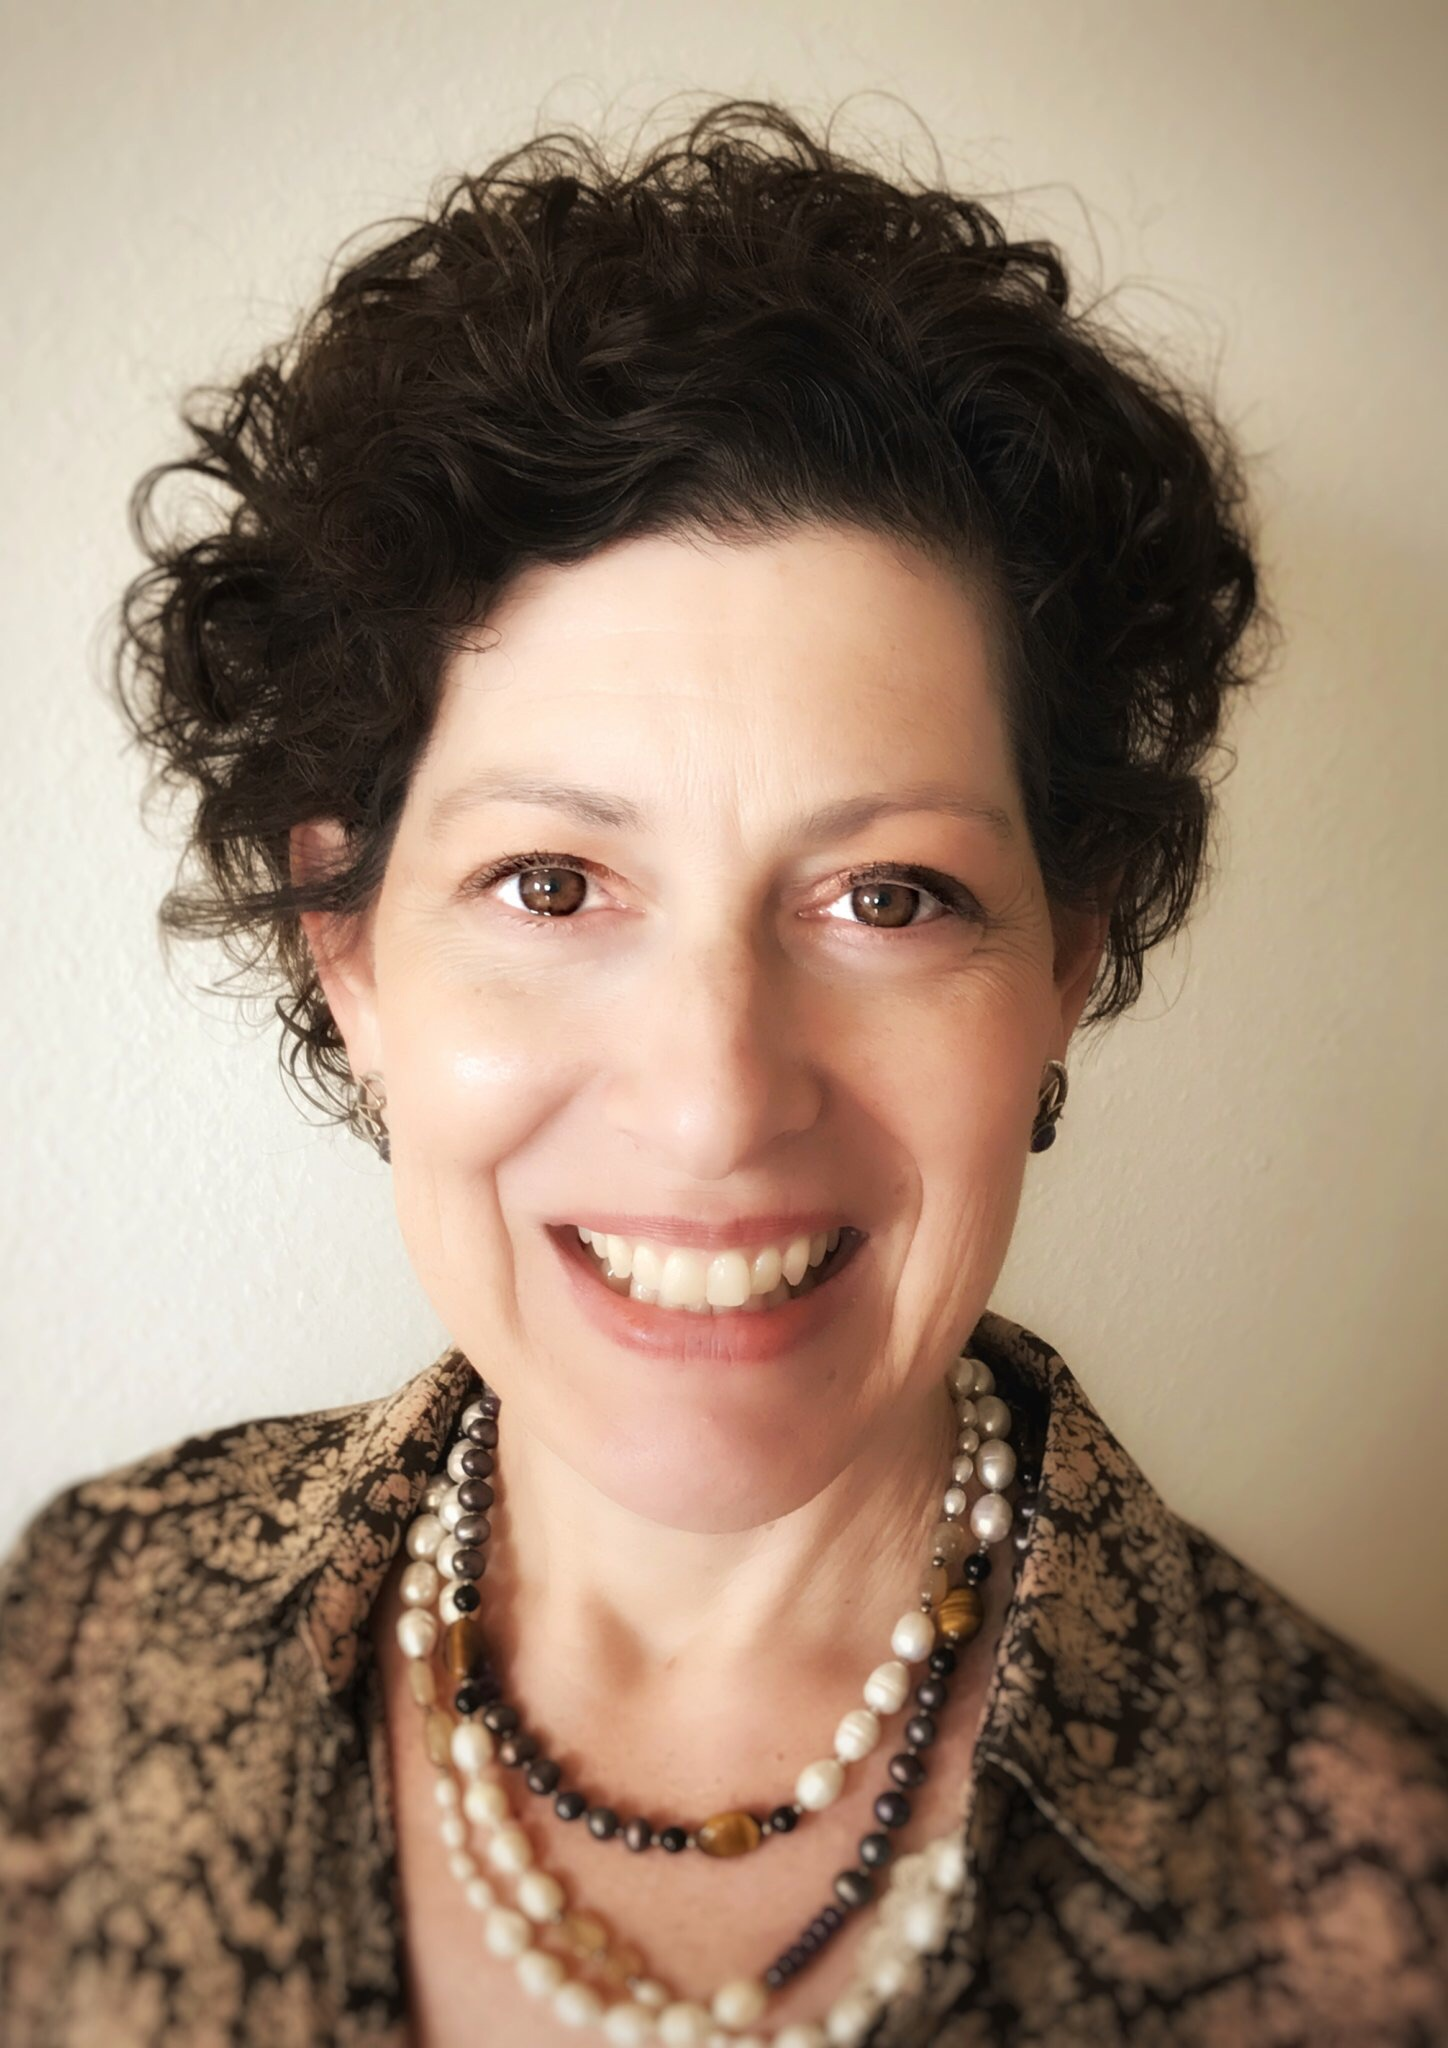 Cheryl McIlhon, Development, transcenDANCE, creative youth development